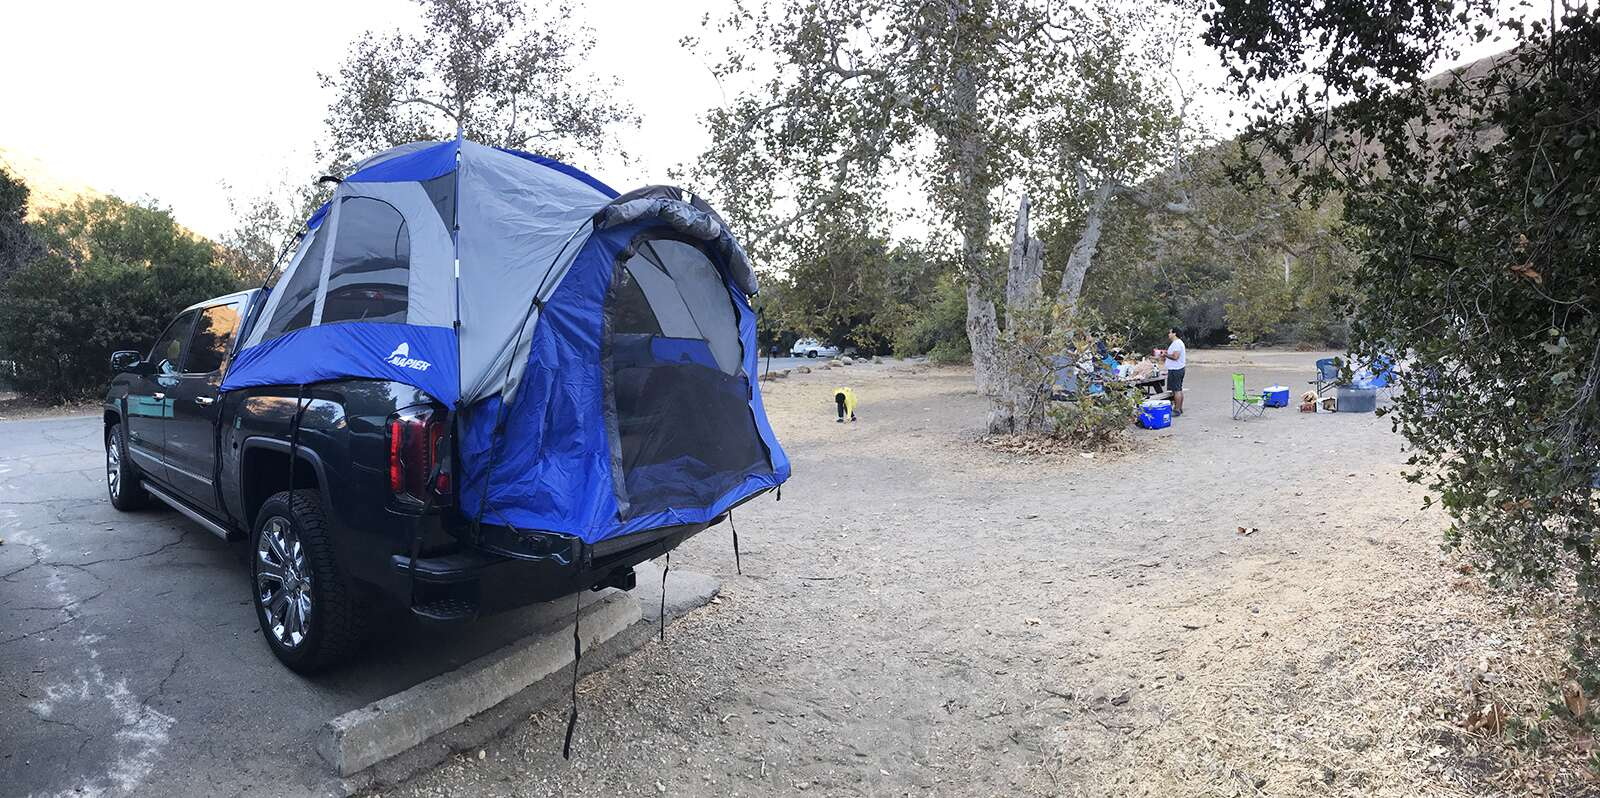 2018 Gmc Sierra 1500 Denali Camping Truck Review The Cure